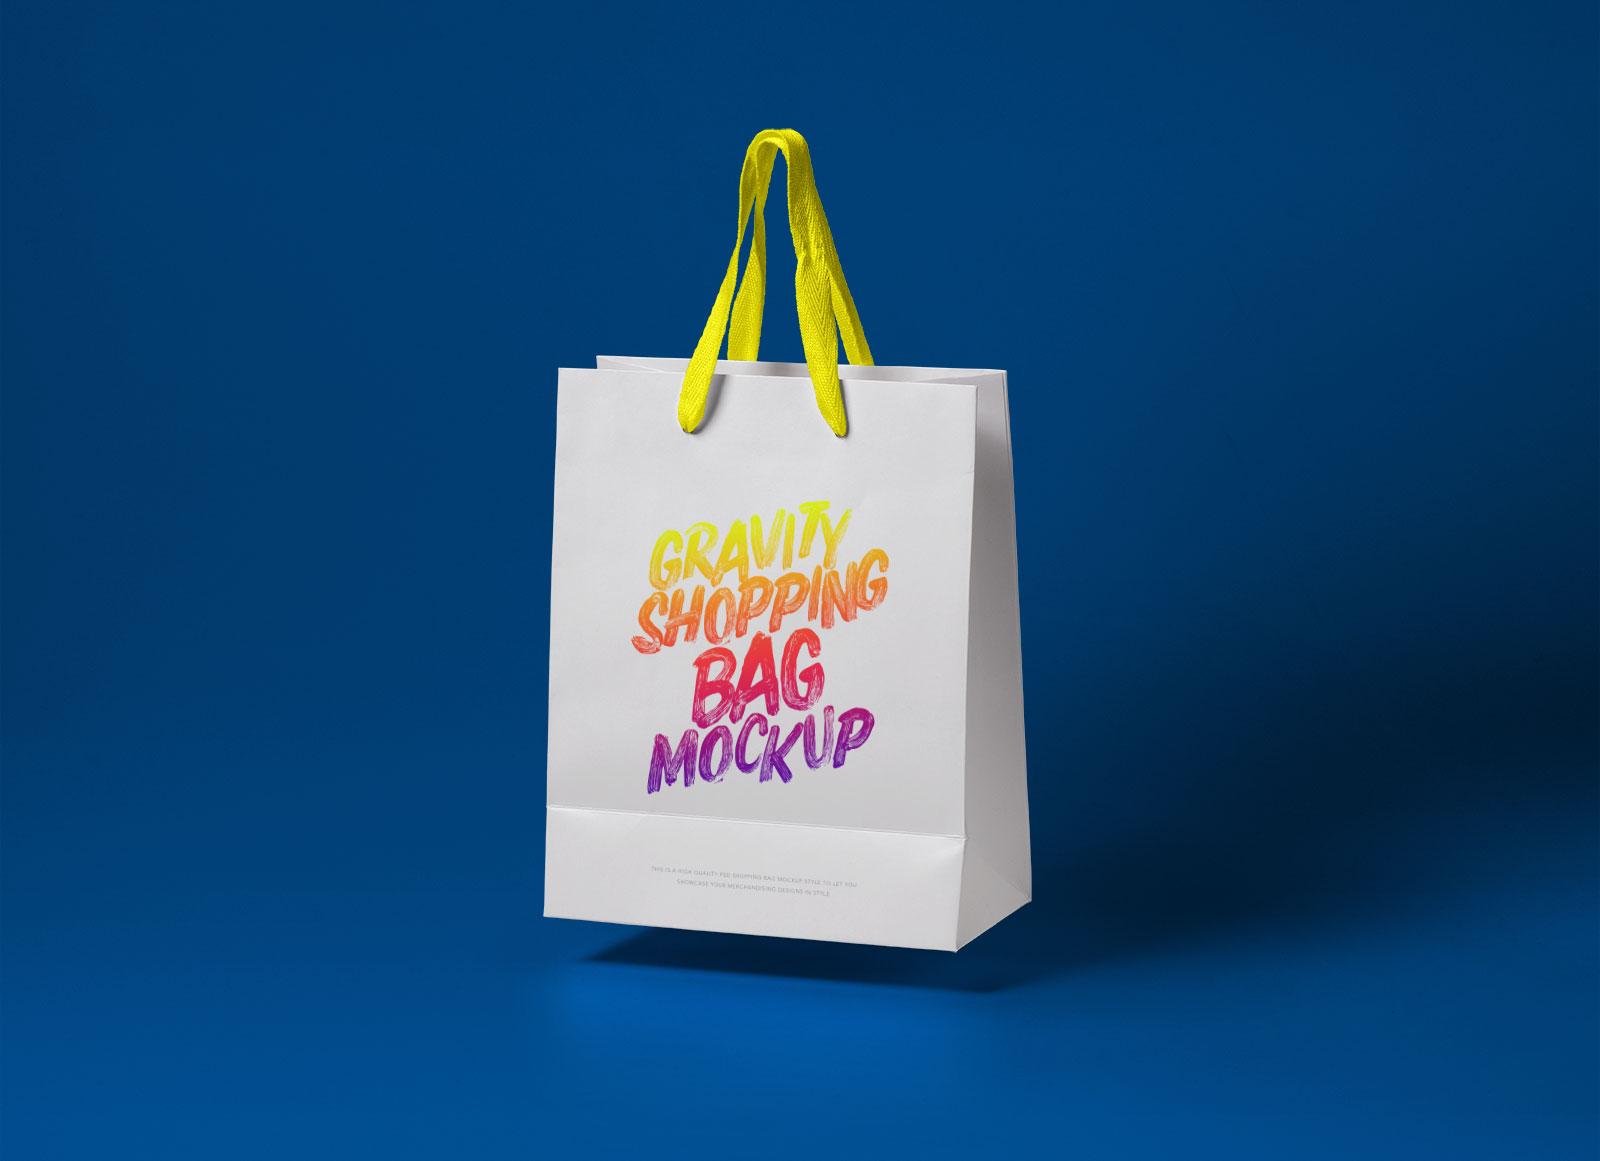 Free-Black-&-White-Floating-Shopping-Bag-Mockup-PSD-2